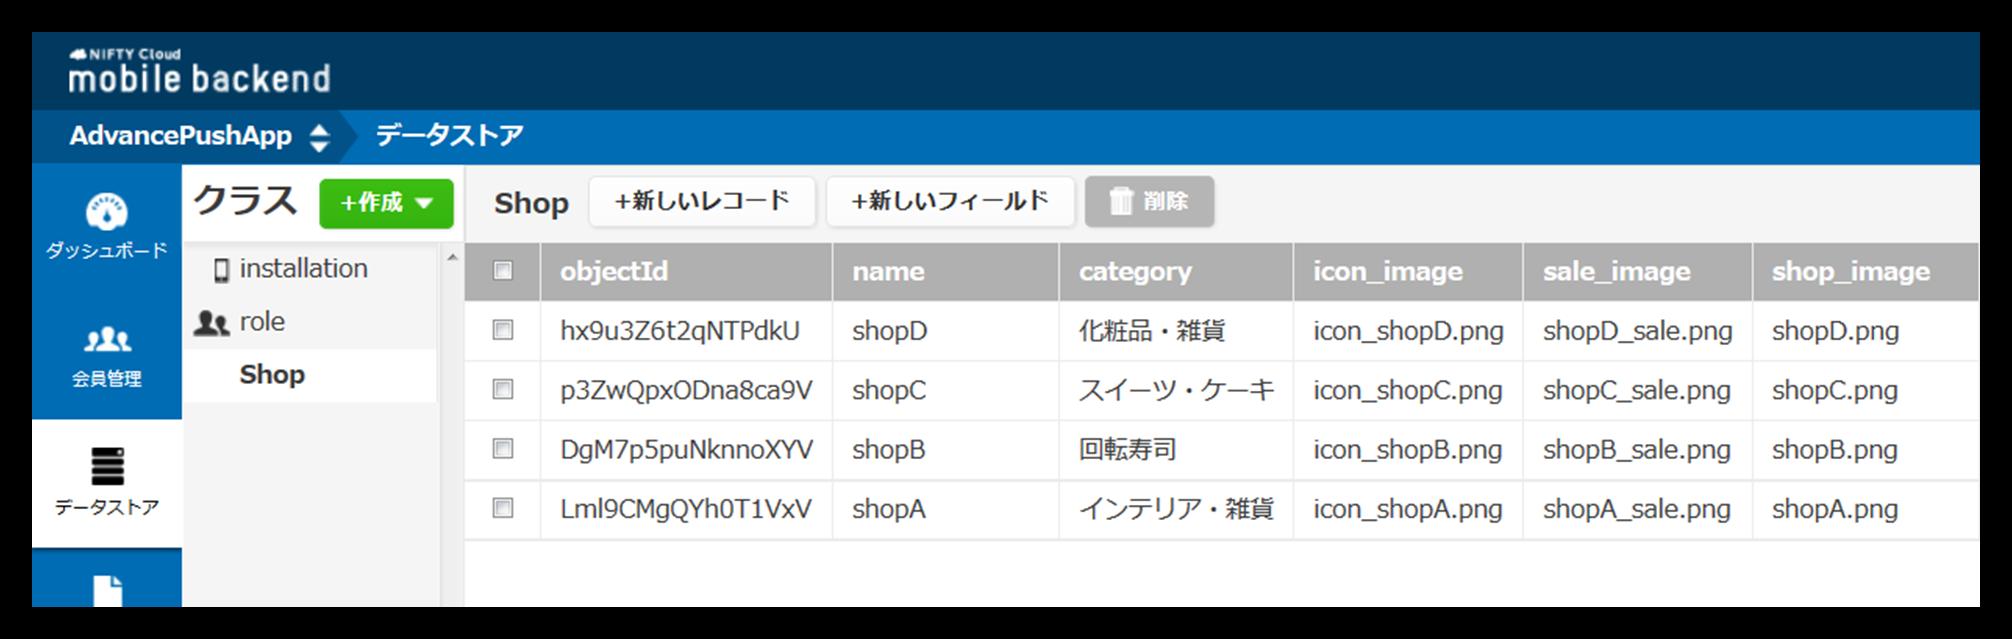 mBaaS_ShopData.PNG